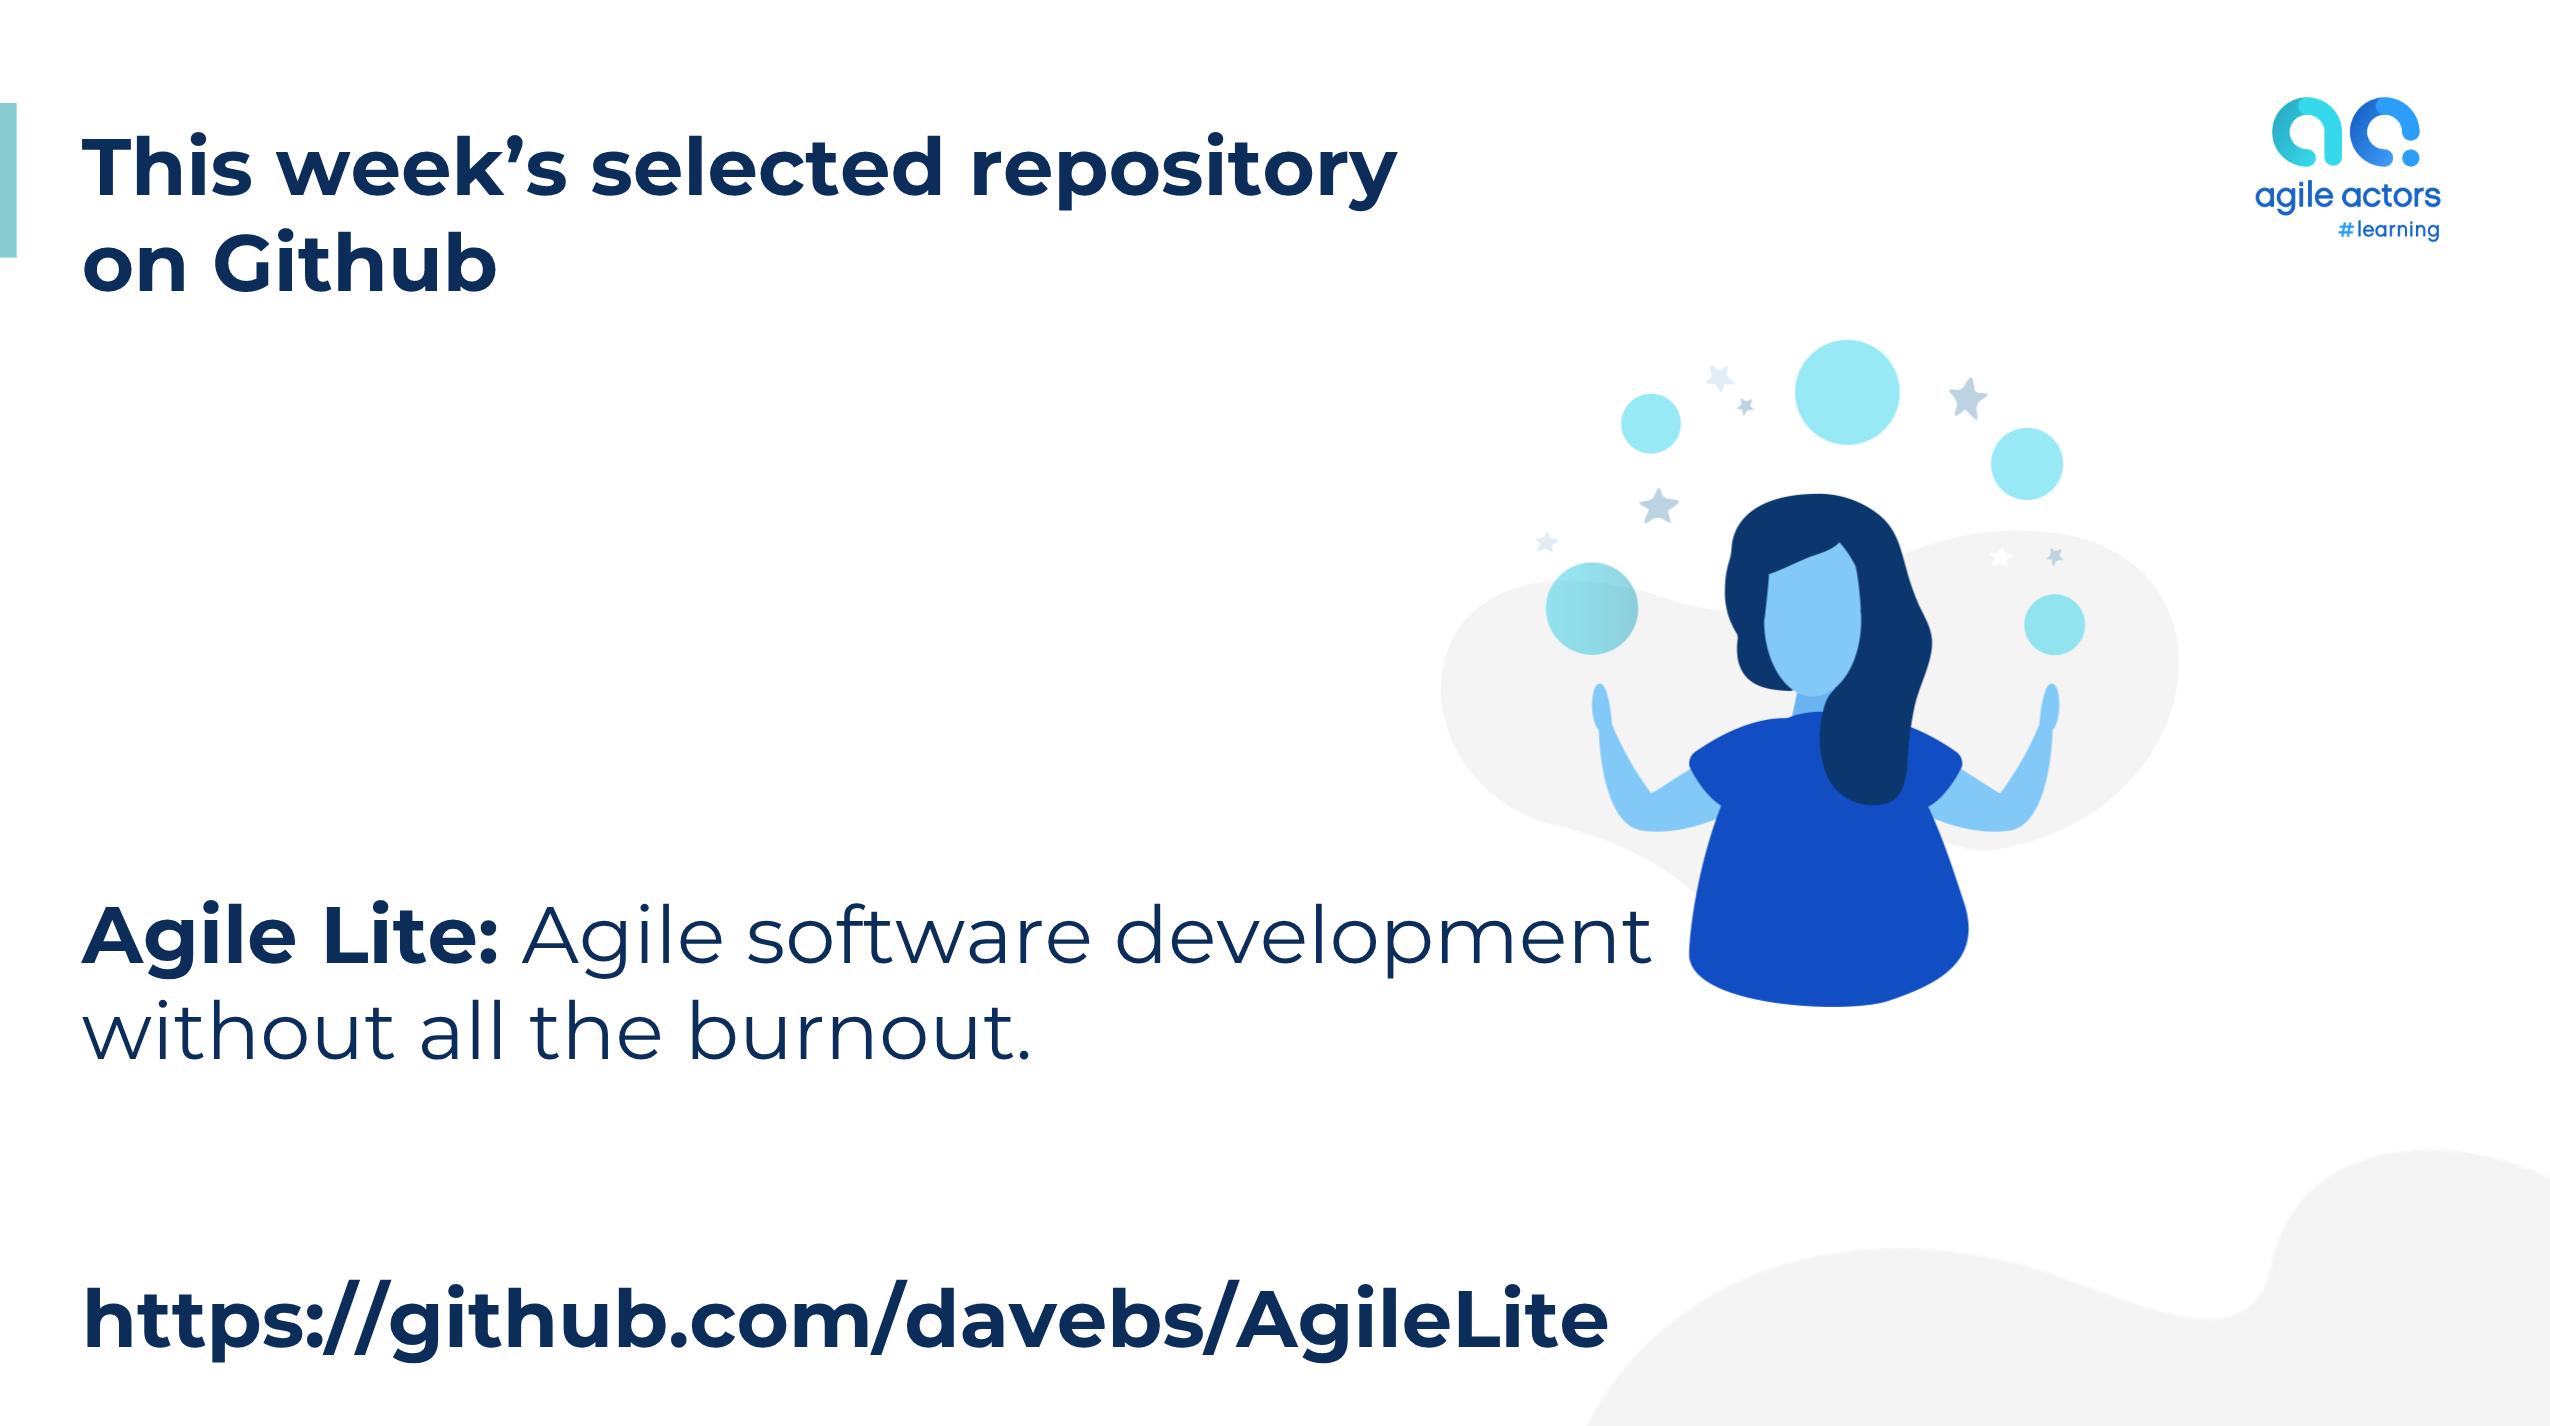 Agile Lite: Agile without all the burnout   Agile Actors